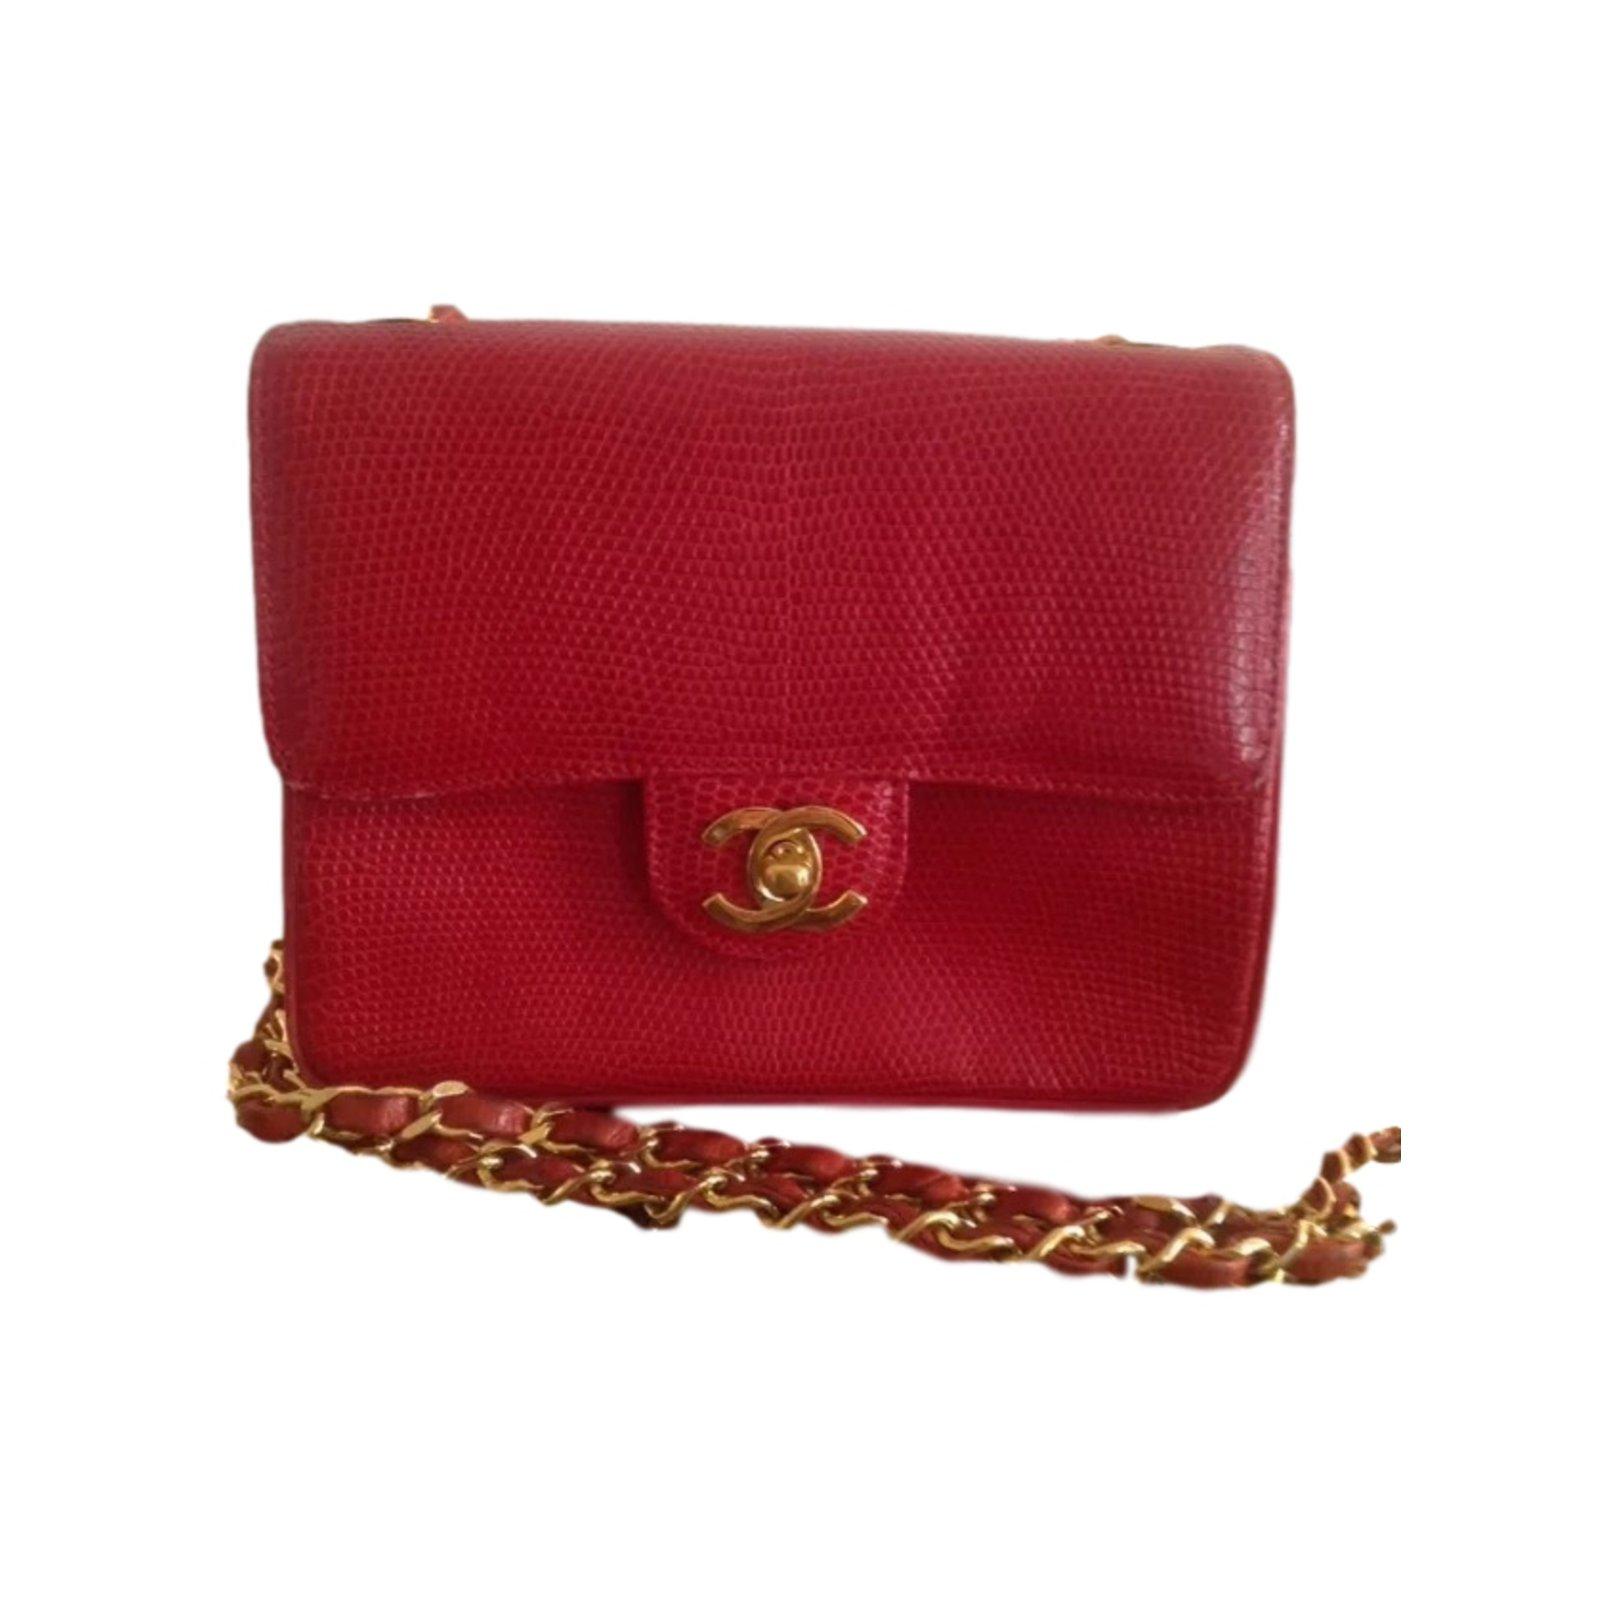 1c3c4722cdc6 Chanel Clutch Bag - Best Model Bag 2018